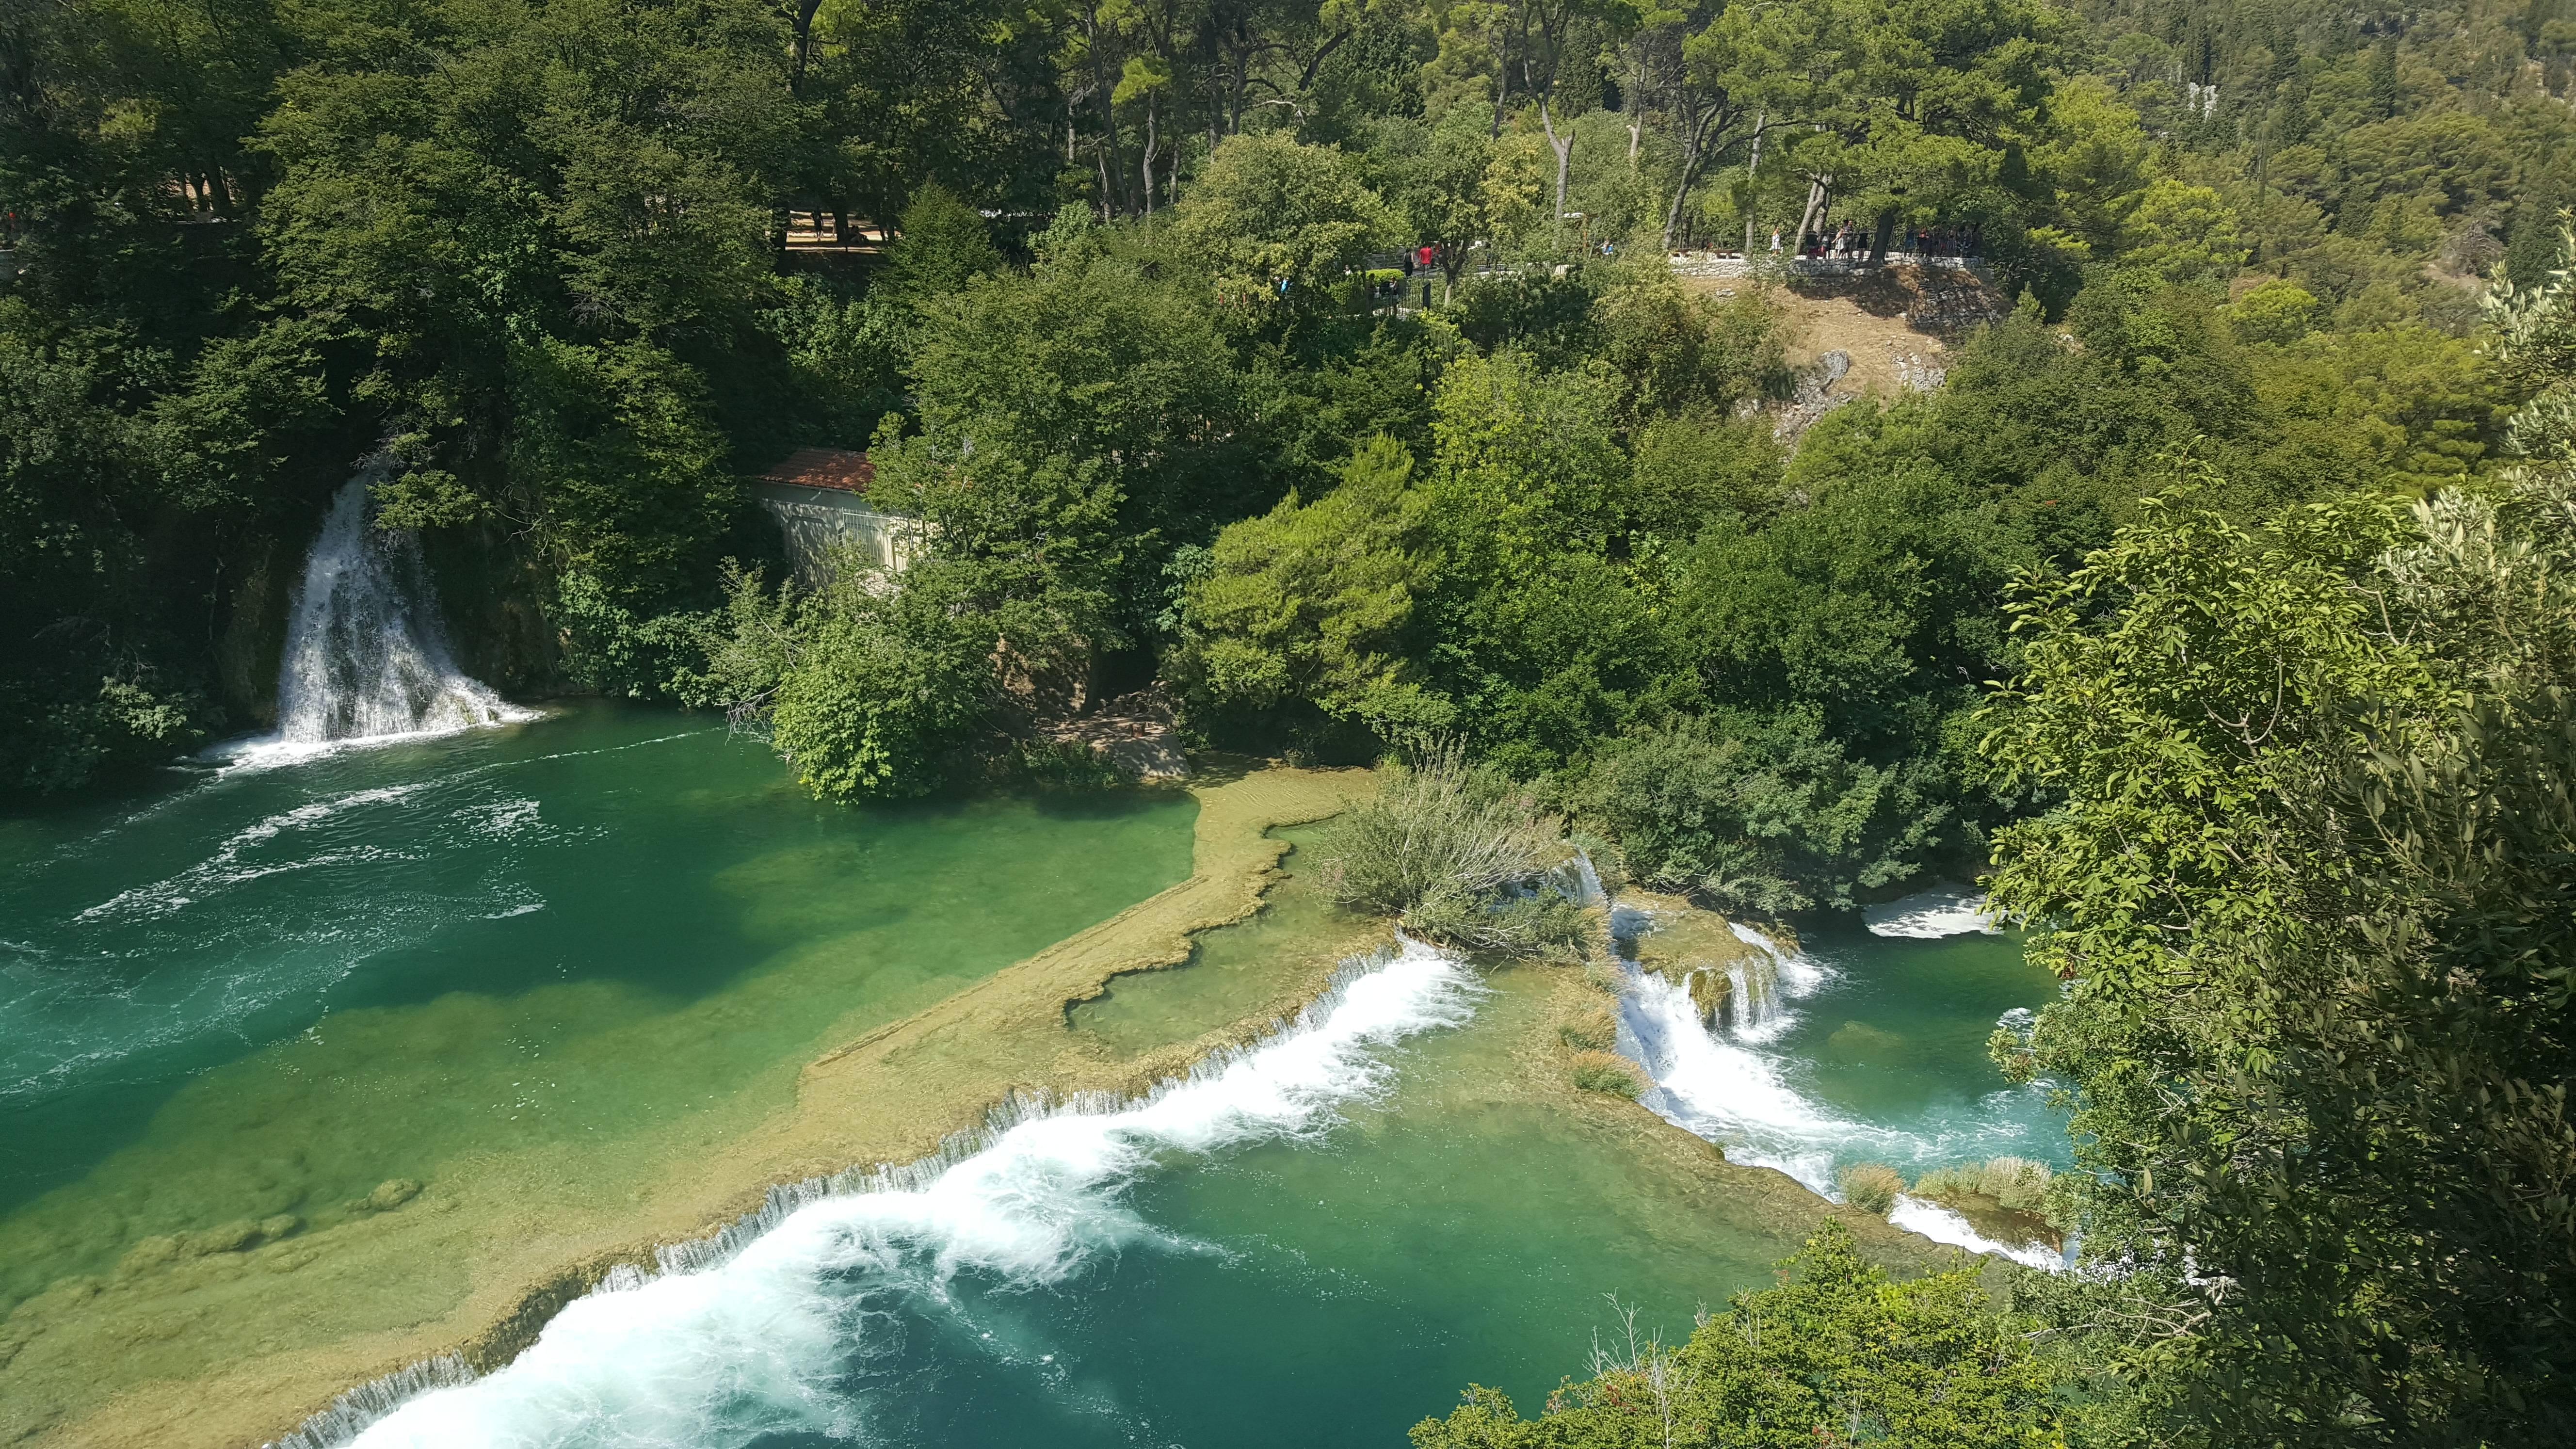 Photo 2: Cascades, Ballades, Baignades sous le soleil croate